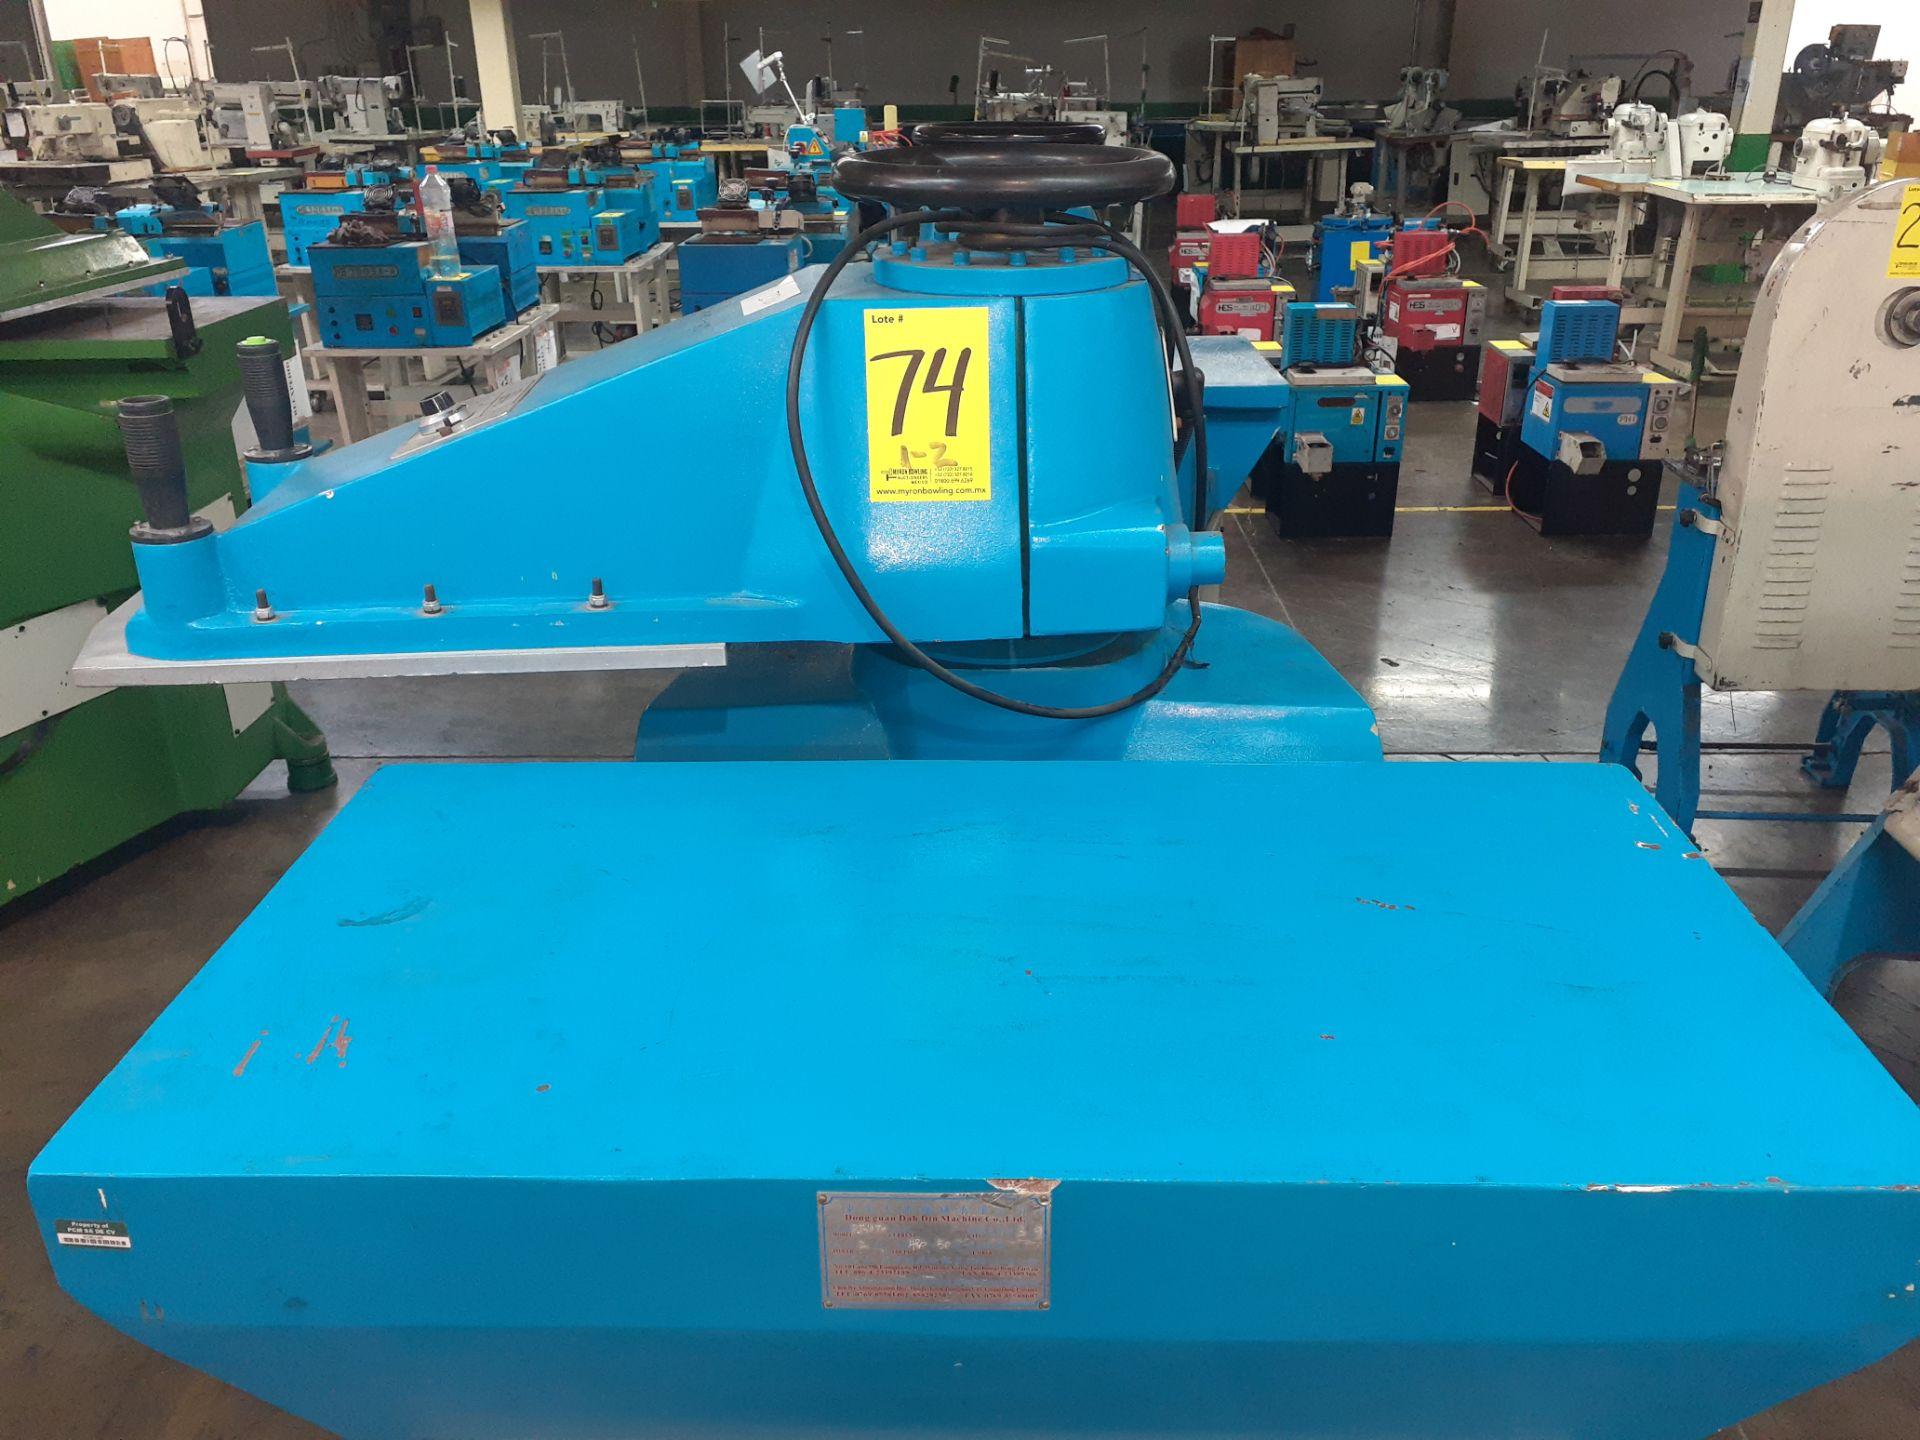 (2) Prensas de corte hidráulica de brazo oscilante, marca Dong guan Dah Dine Machine, Modelo: DJ-103 - Image 8 of 17